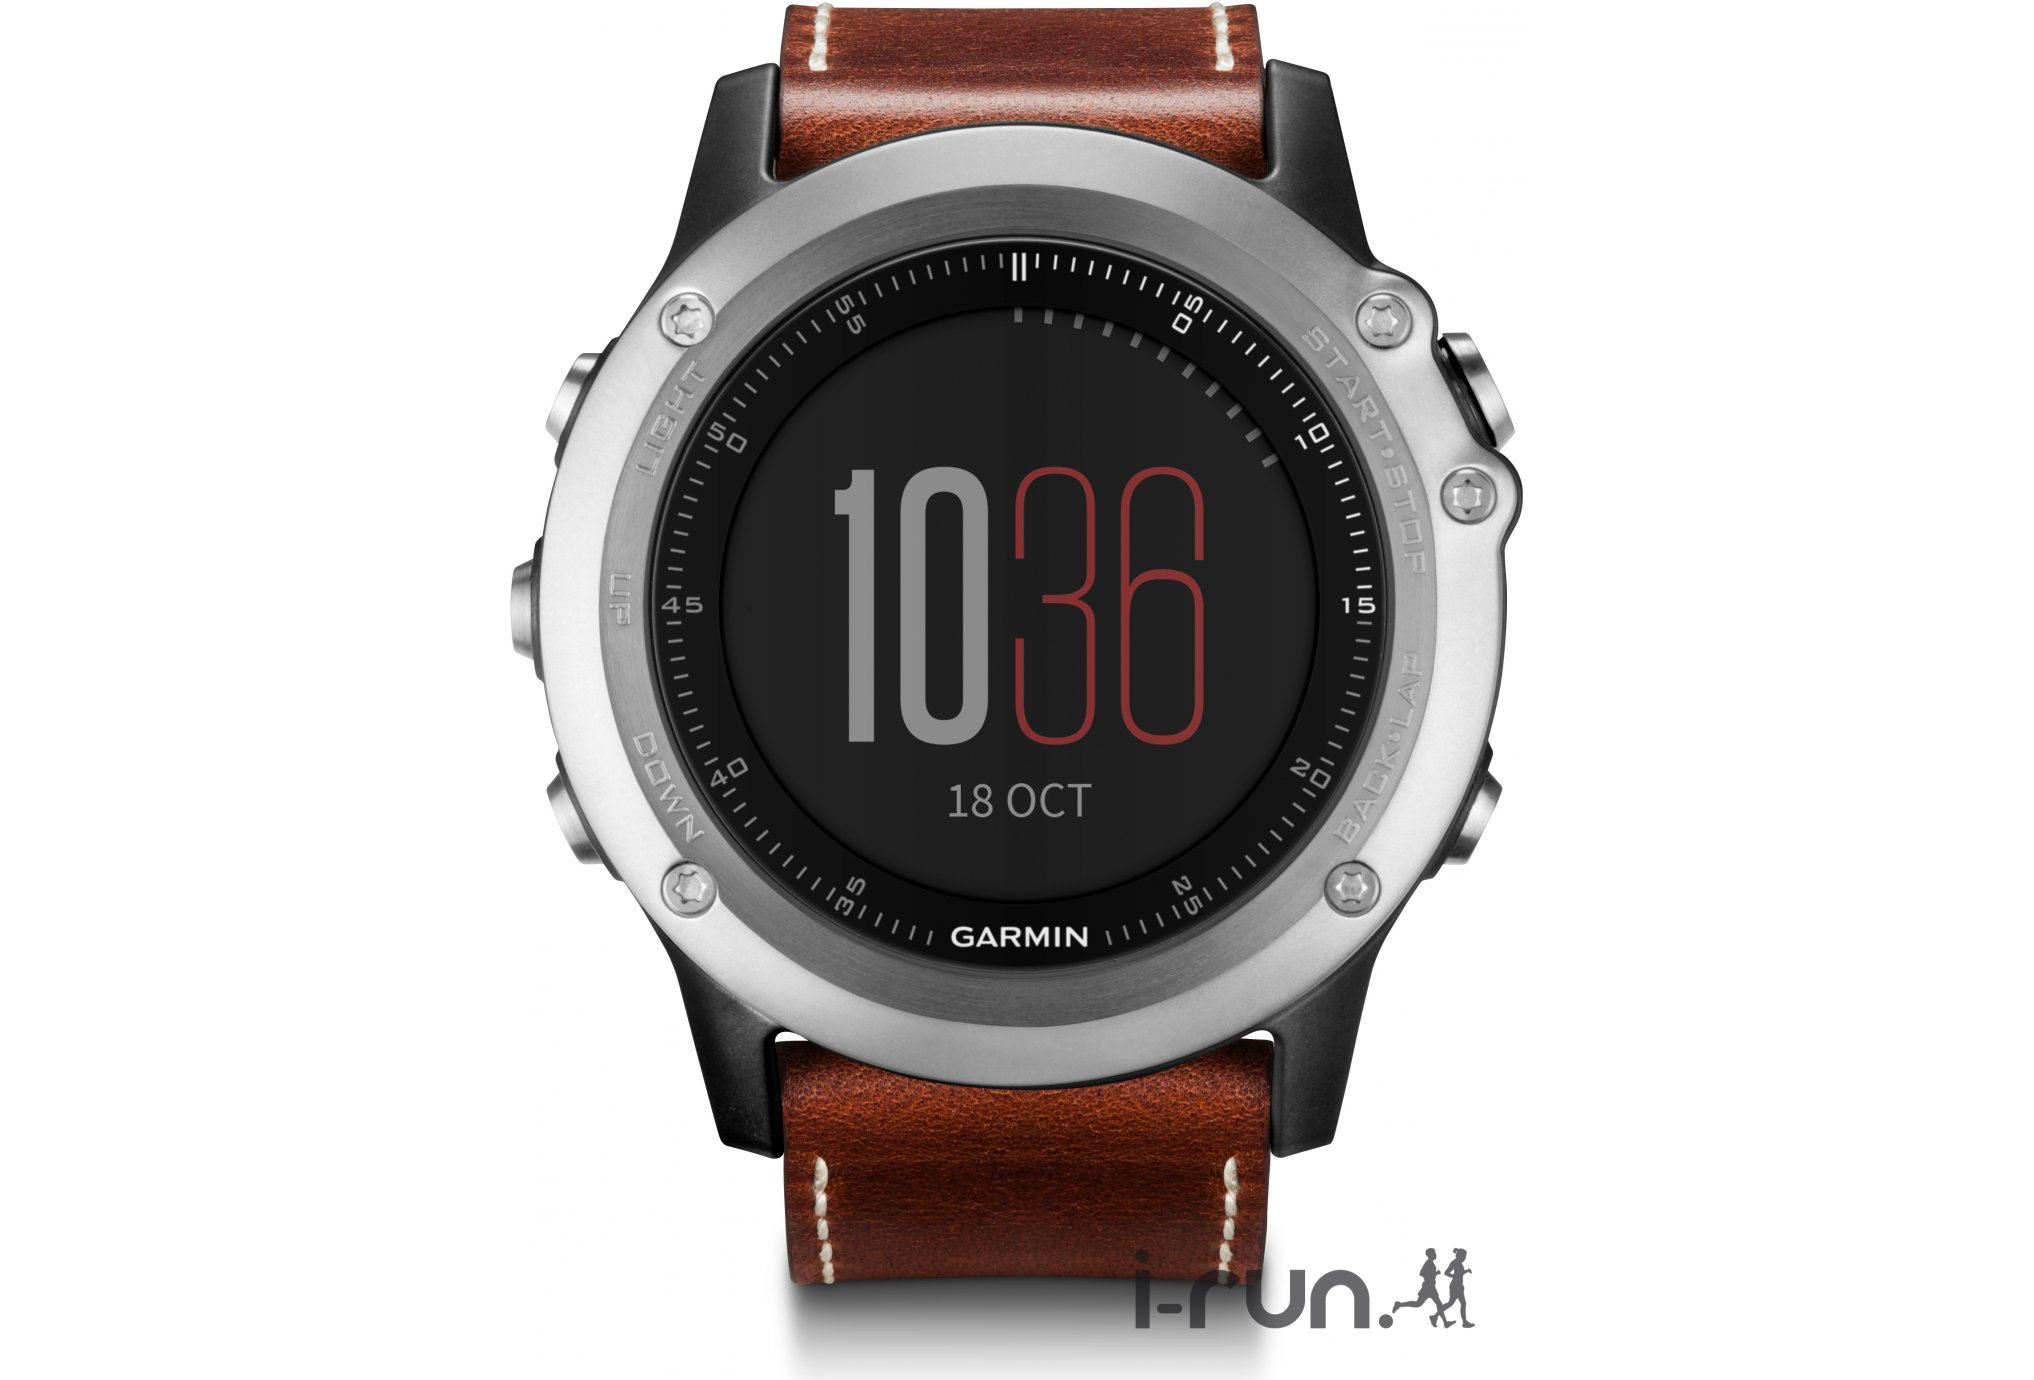 Garmin Fenix 3 gps sapphire edition hrm-Run cardio-gps